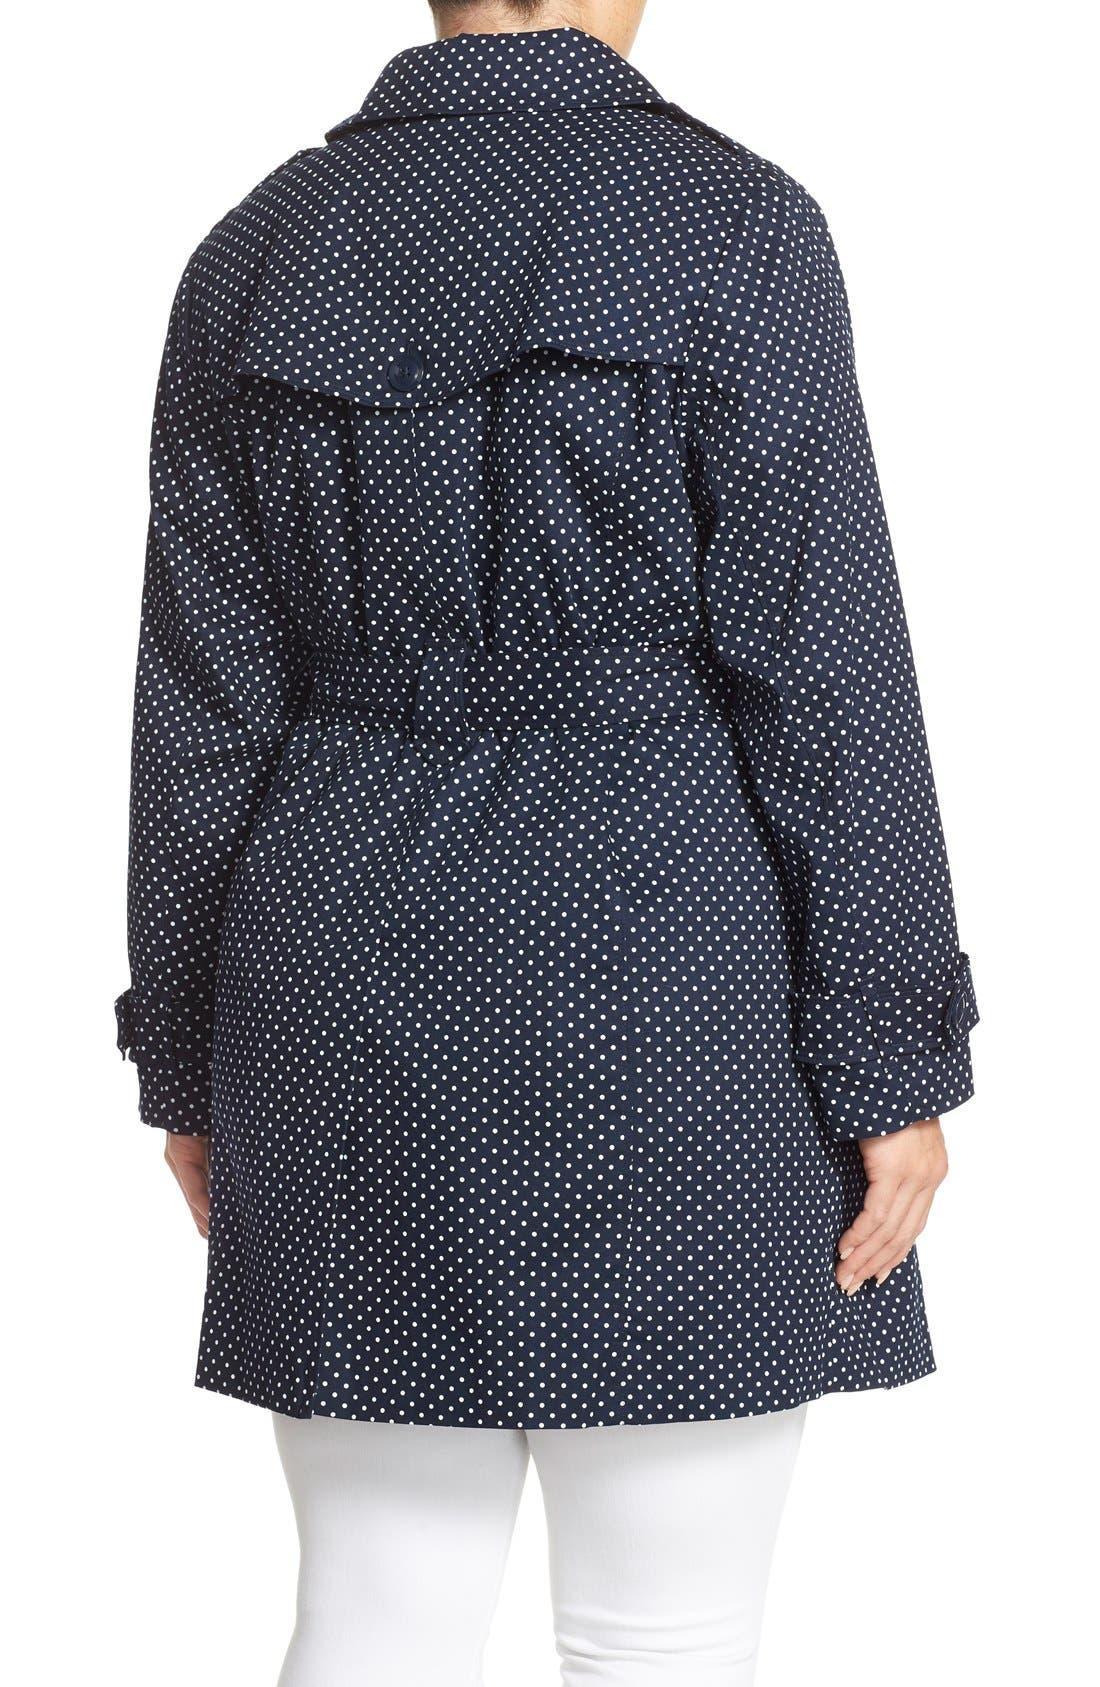 Alternate Image 2  - London Fog Polka Dot Single Breasted Trench Coat (Plus Size)